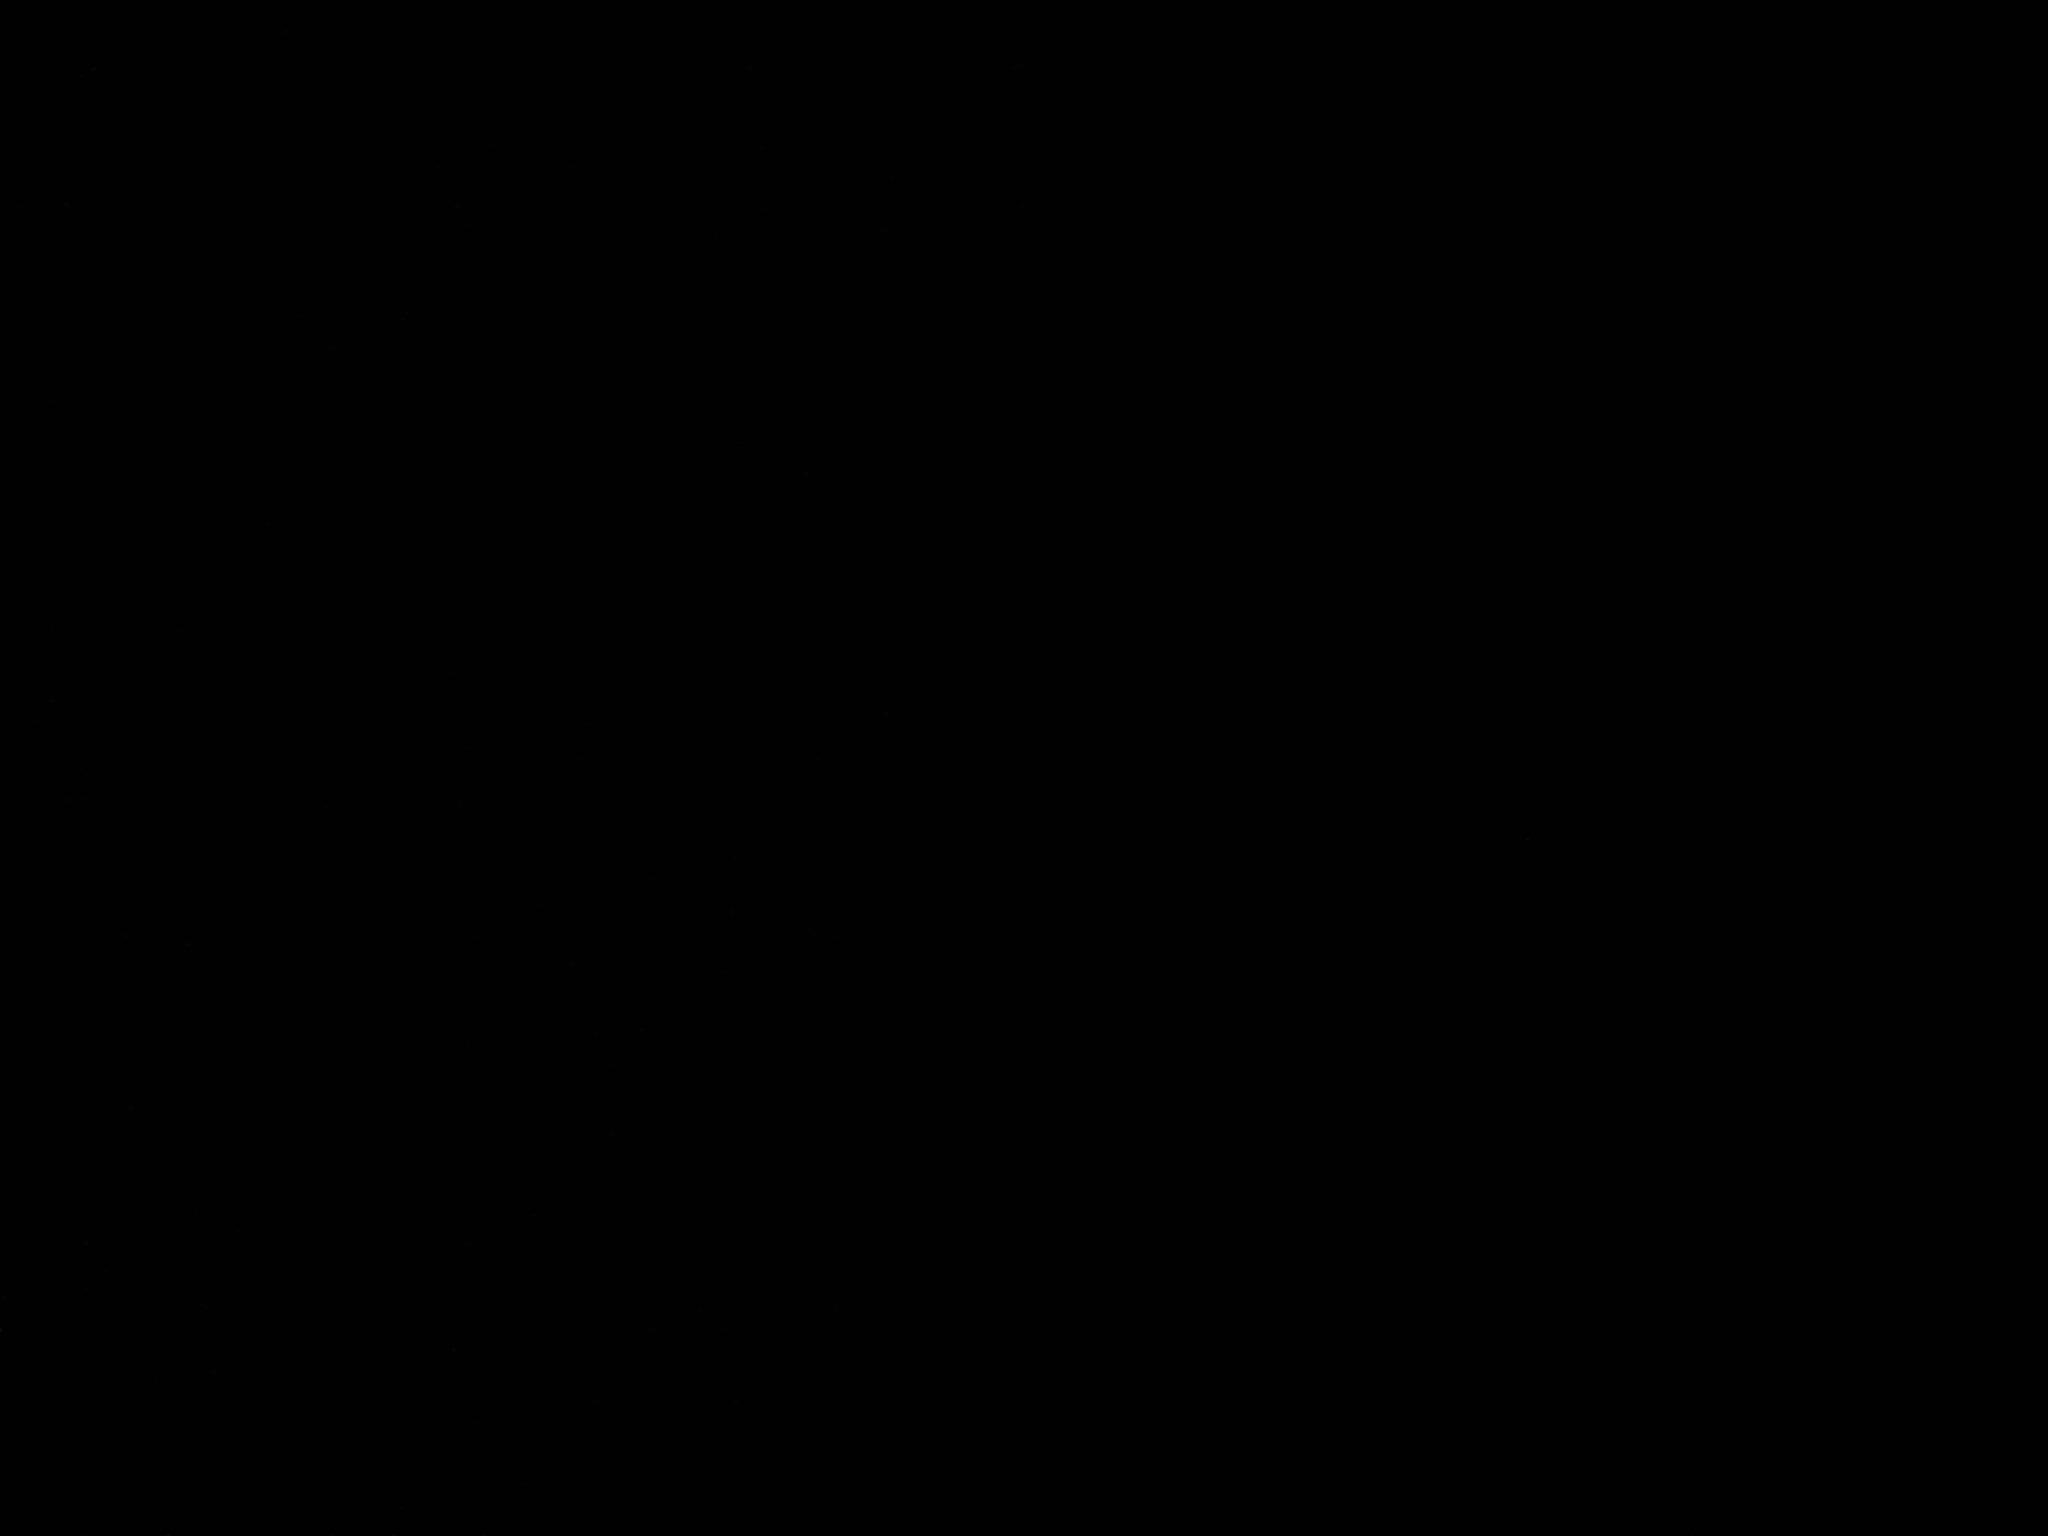 c0204622_17585386.jpg